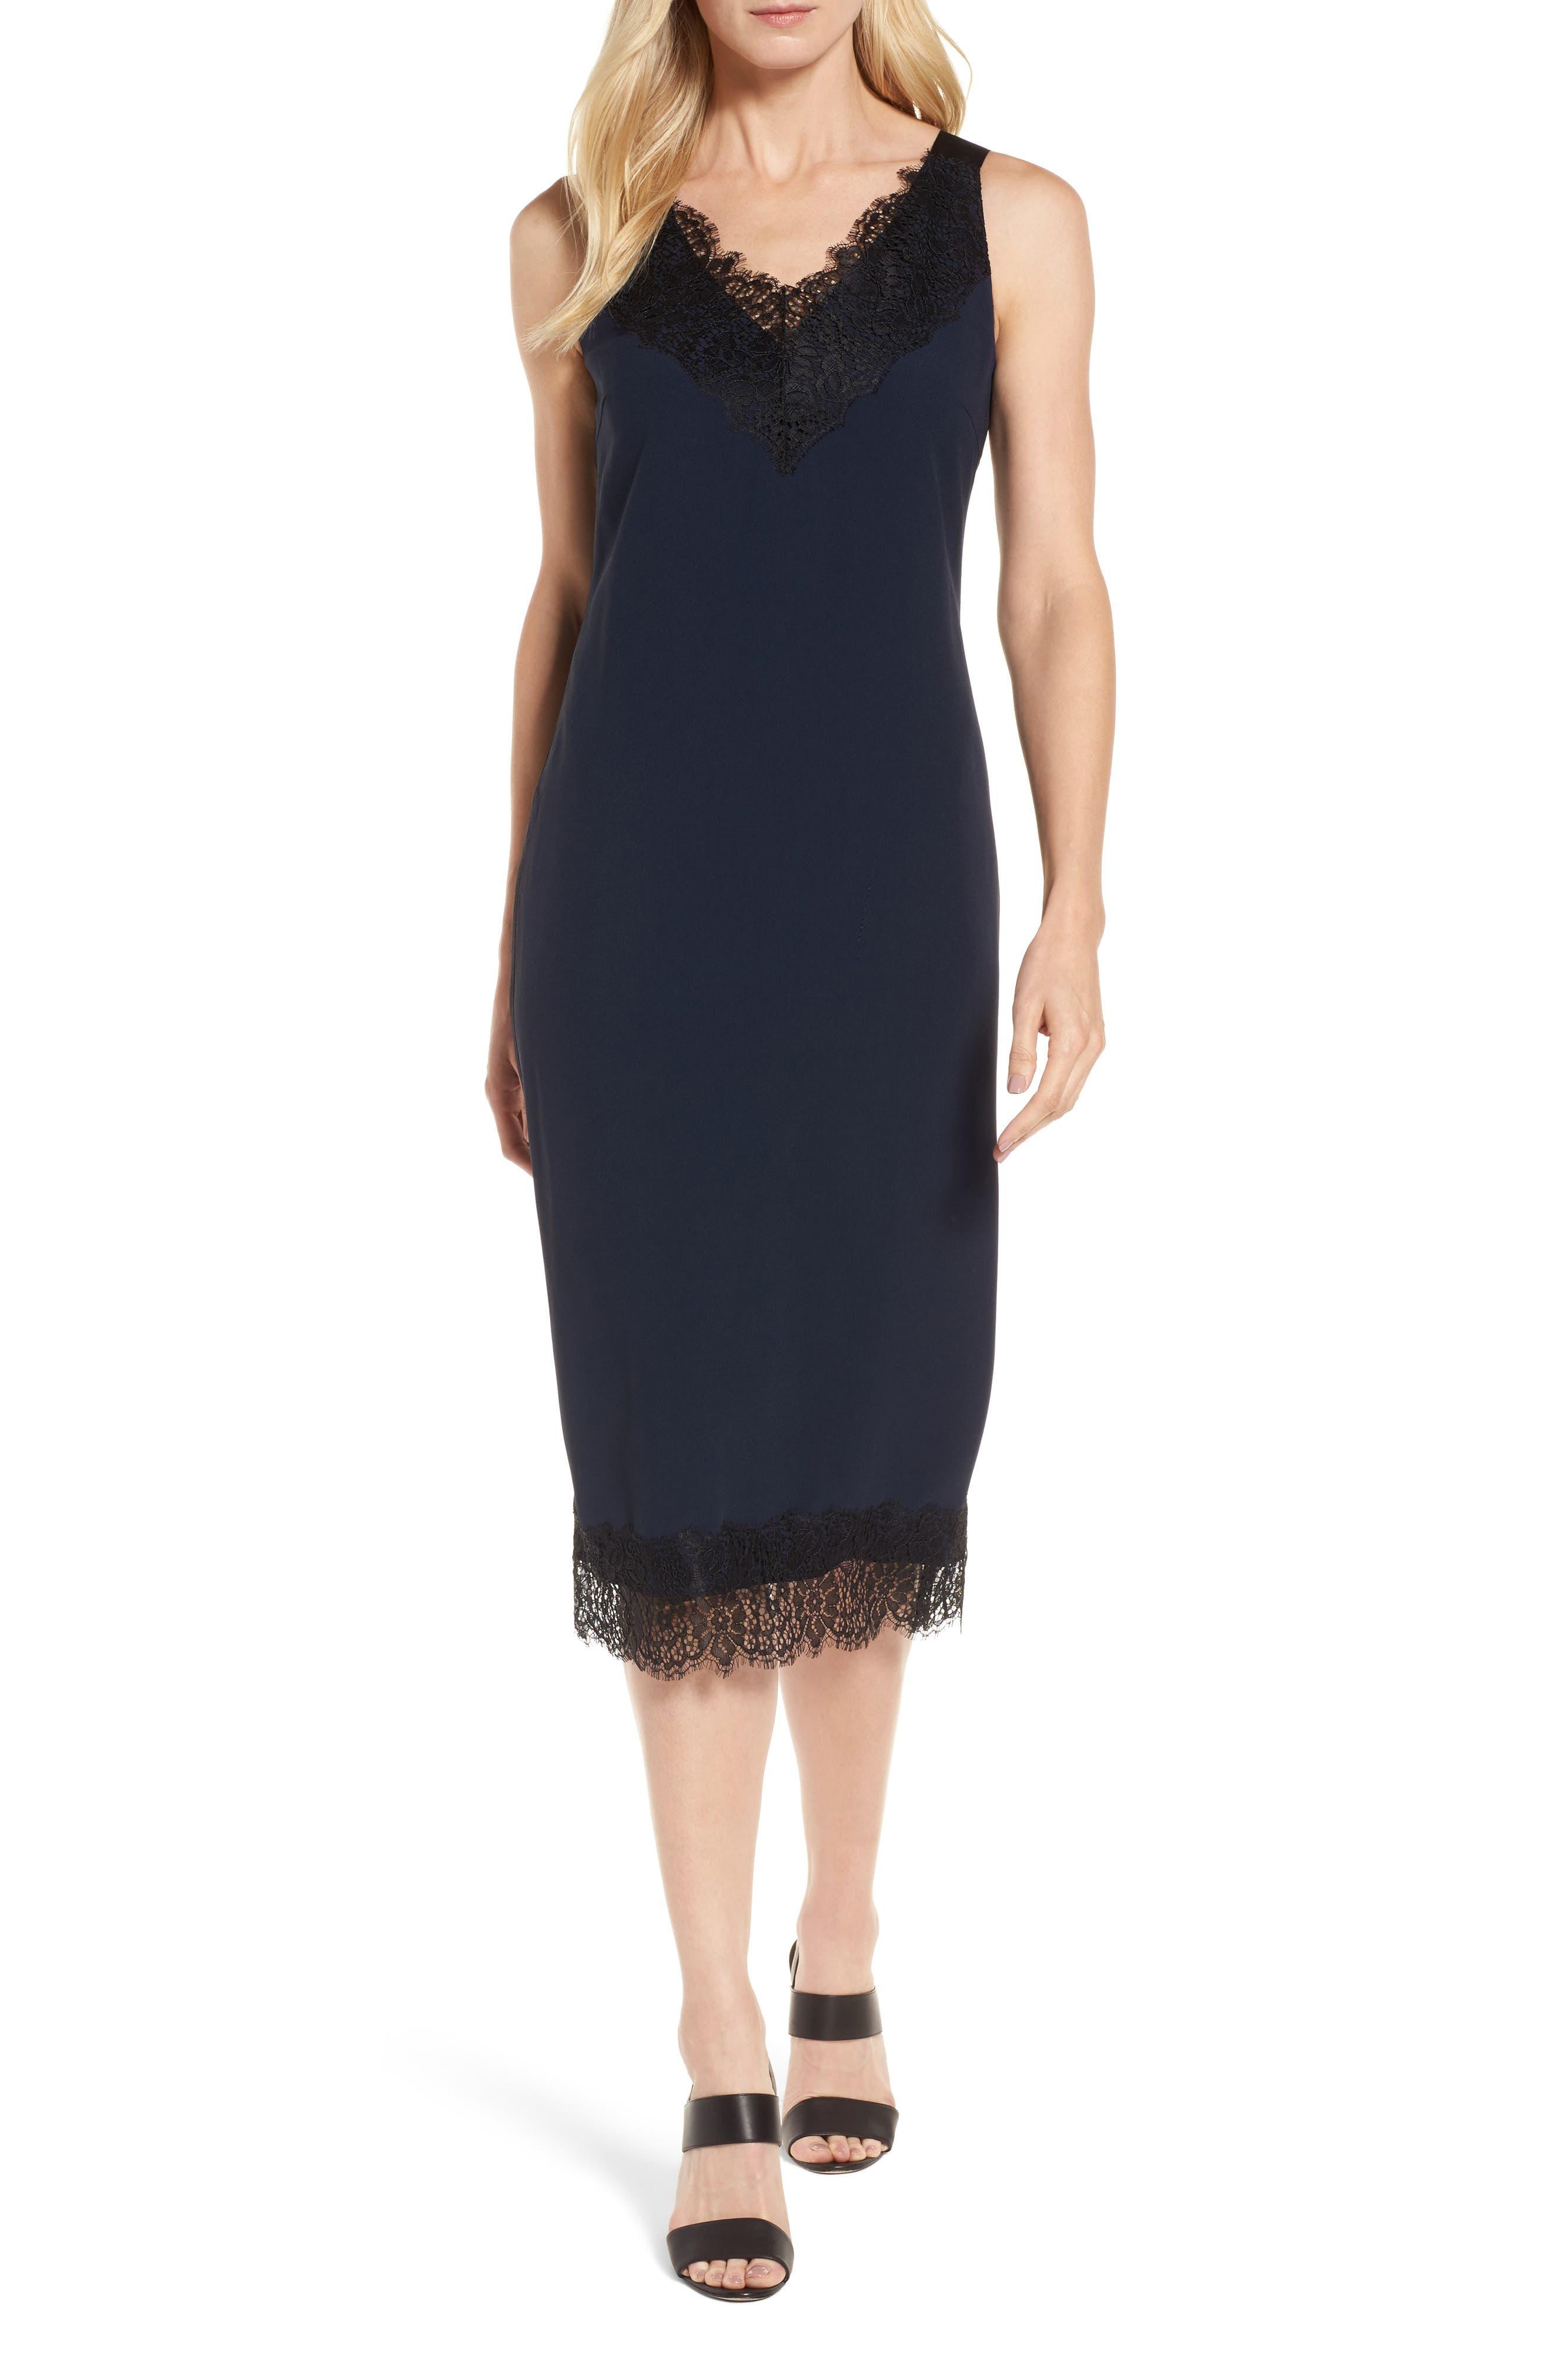 Haminka Lace Trim Shift Dress,                         Main,                         color, 480